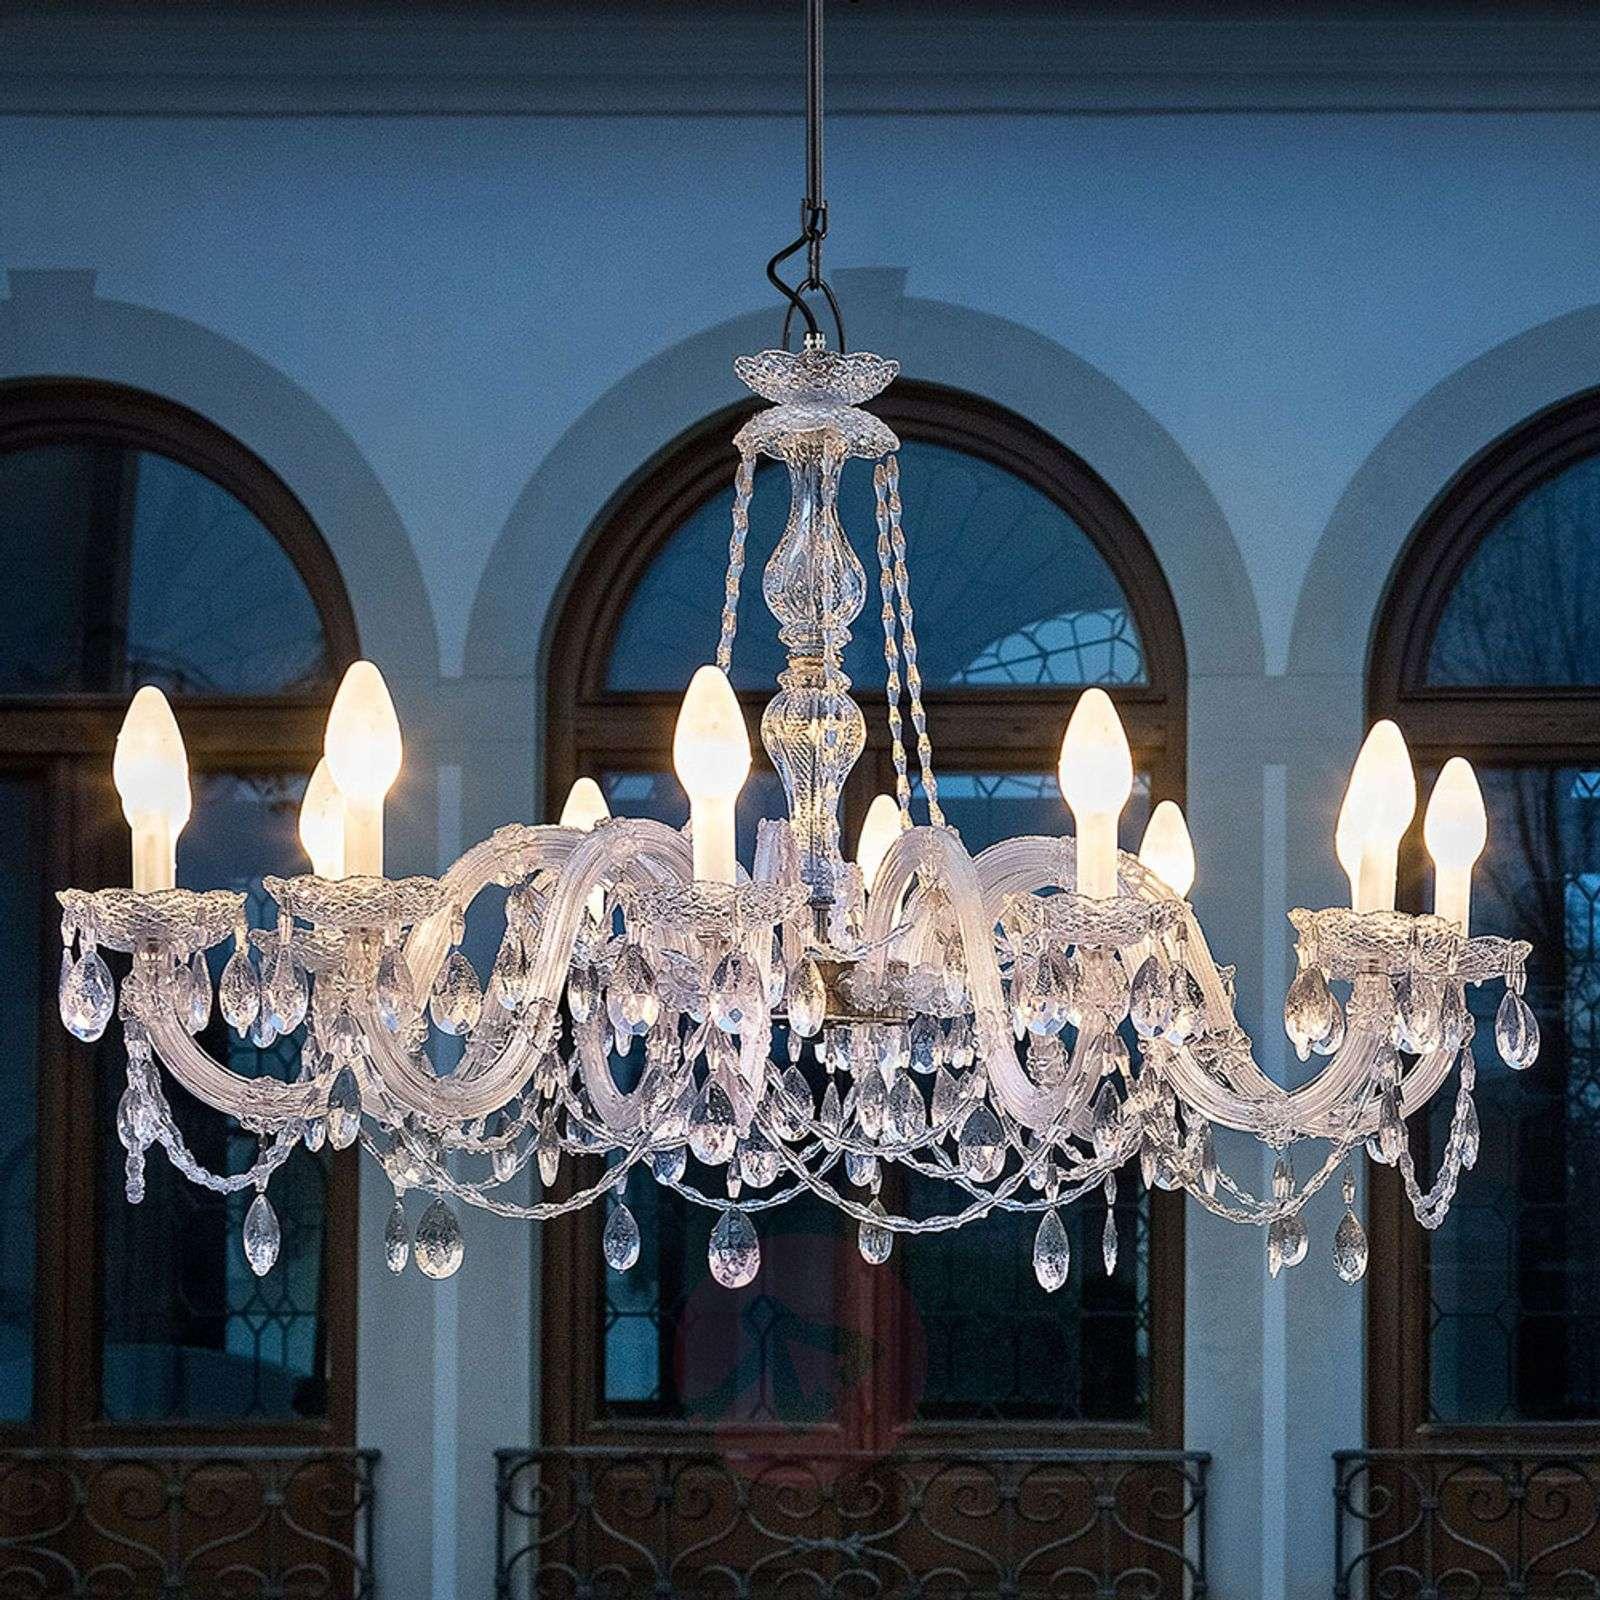 Drylight s12 12 bulb outdoor led chandelier lights aloadofball Gallery